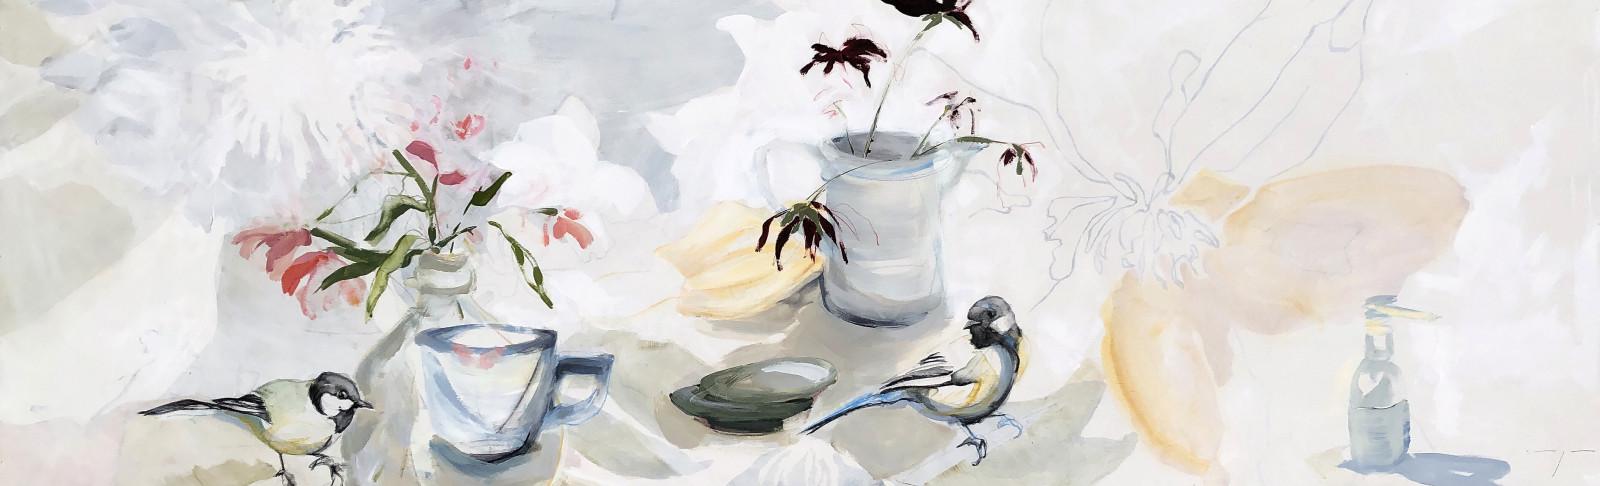 Birds and Flowers Still life   Original Artwork